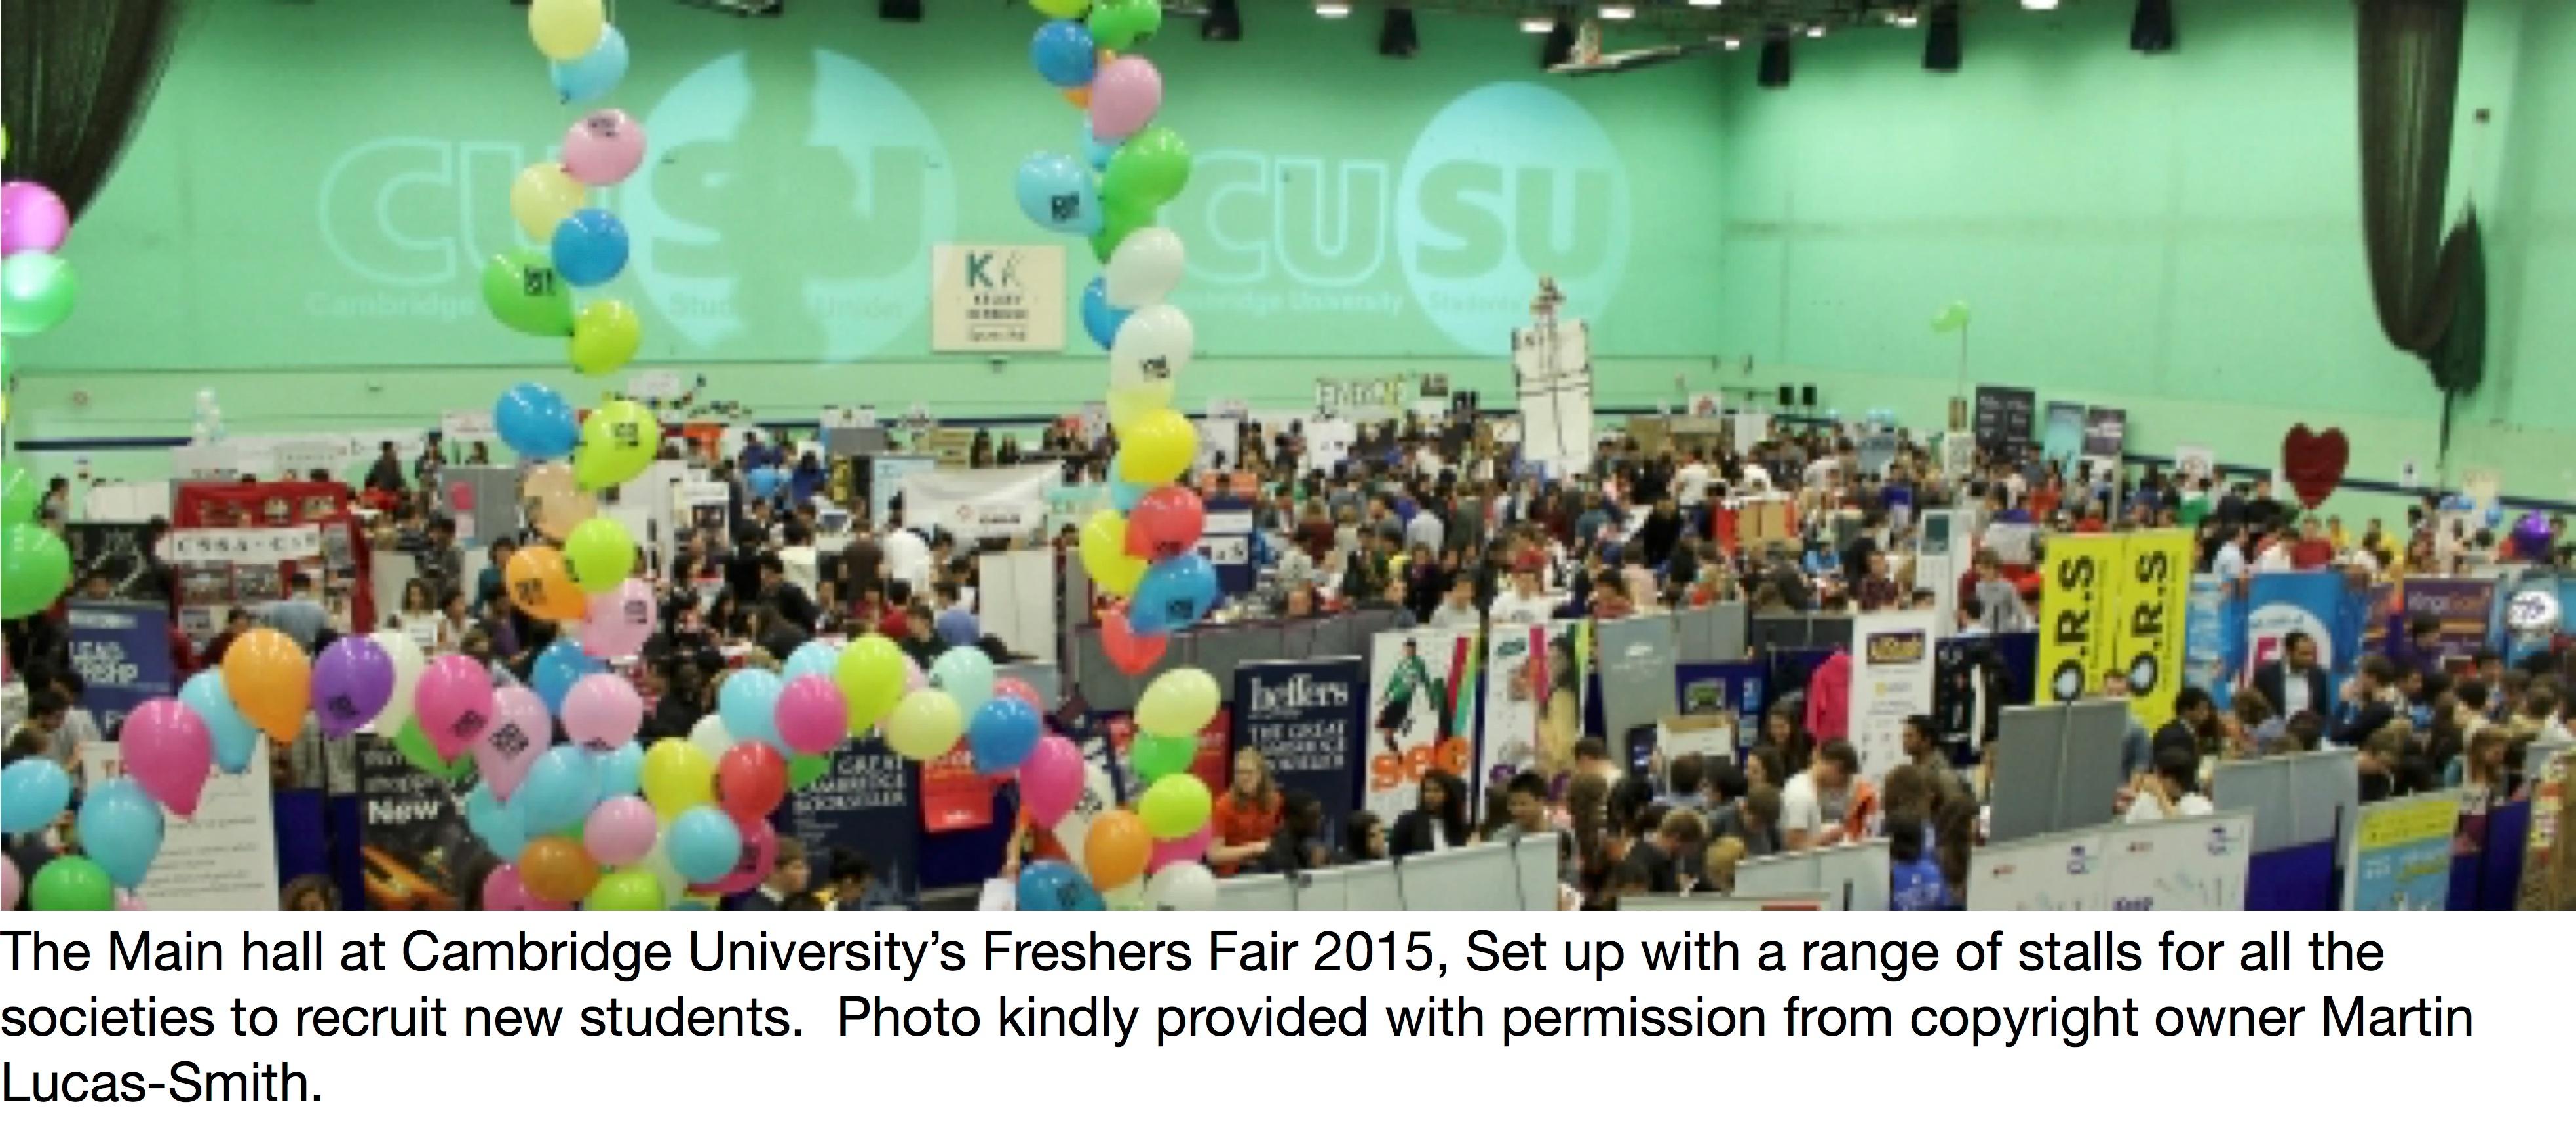 Freshers Fair at Cambridge University in the UK